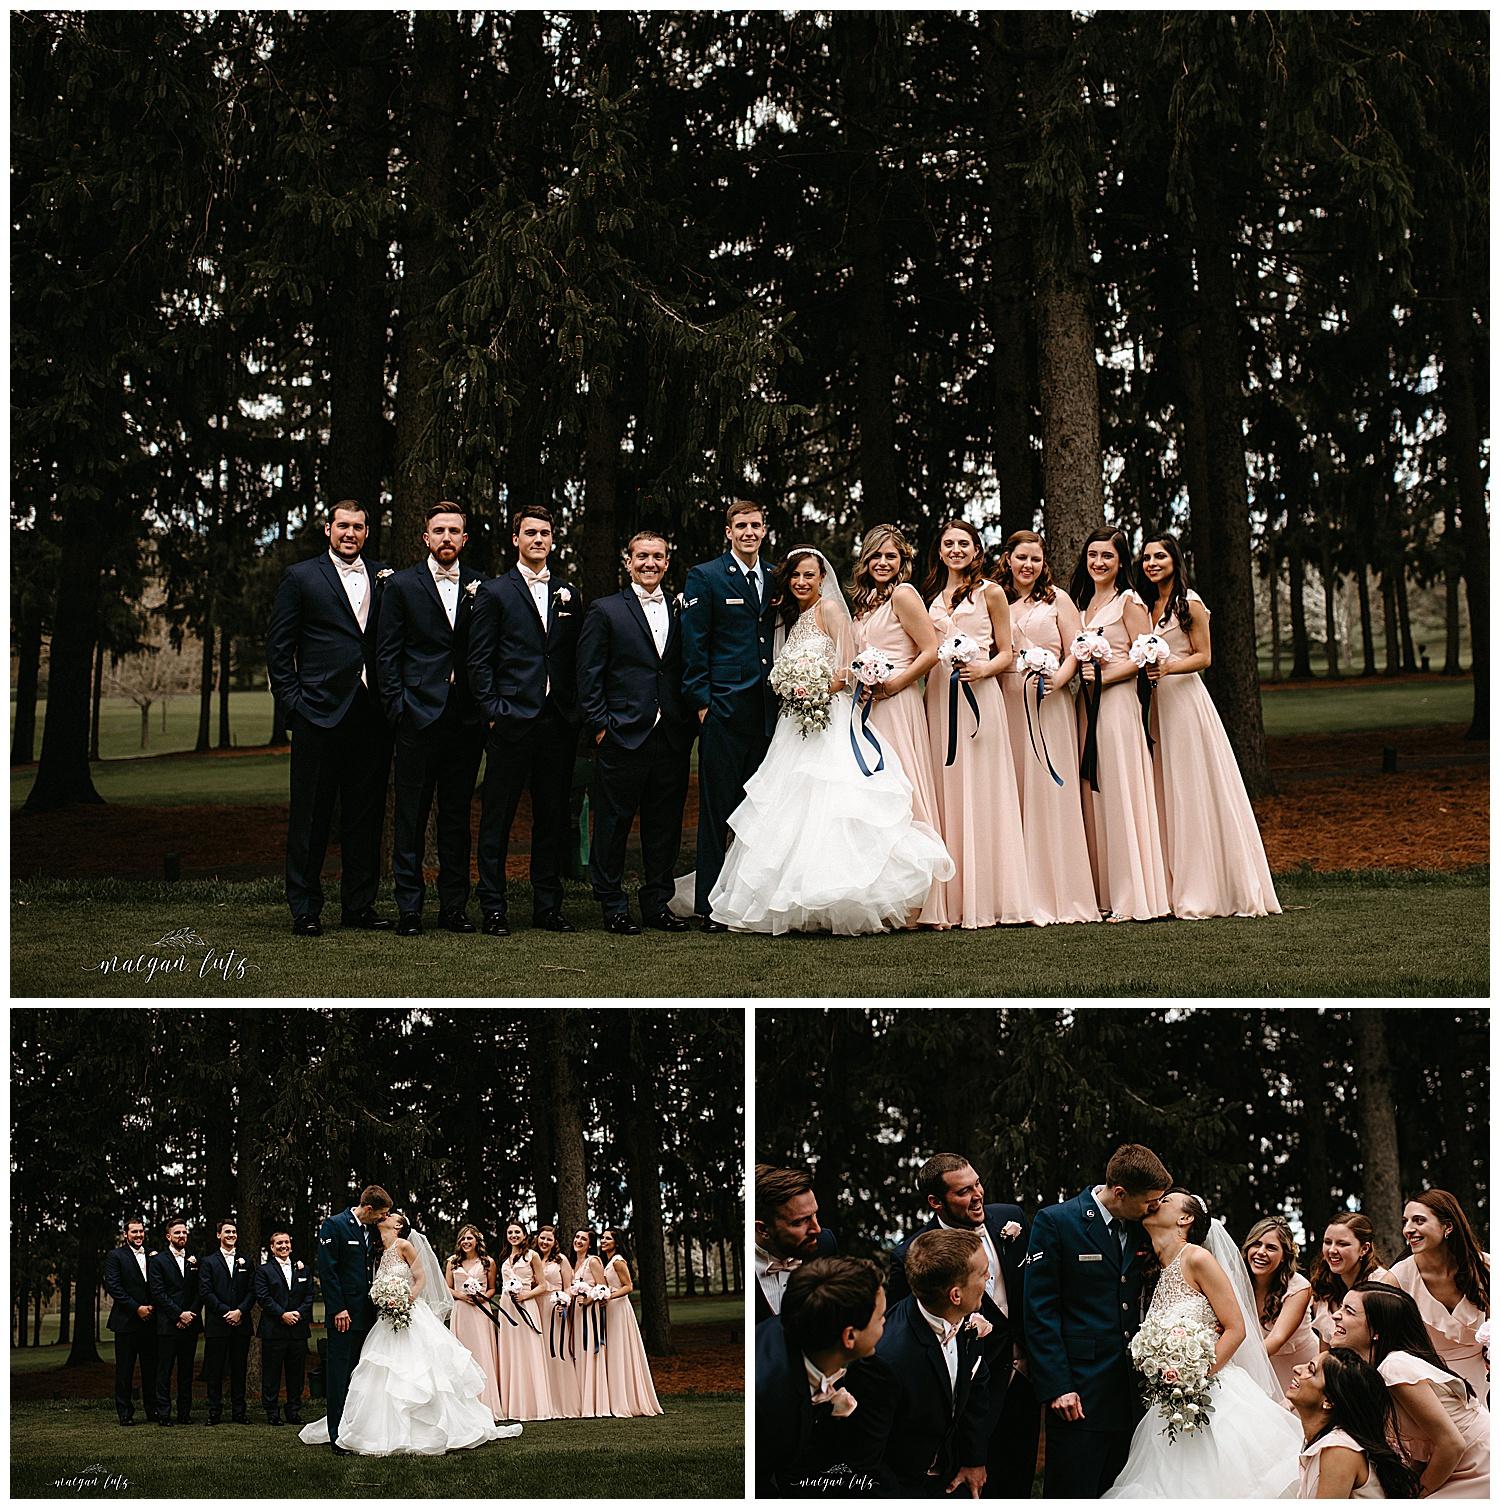 NEPA-Lehigh-Valley-Wedding-Photographer-at-Glen-Oak-Country-Club-Clarks-Summit-PA_0036.jpg